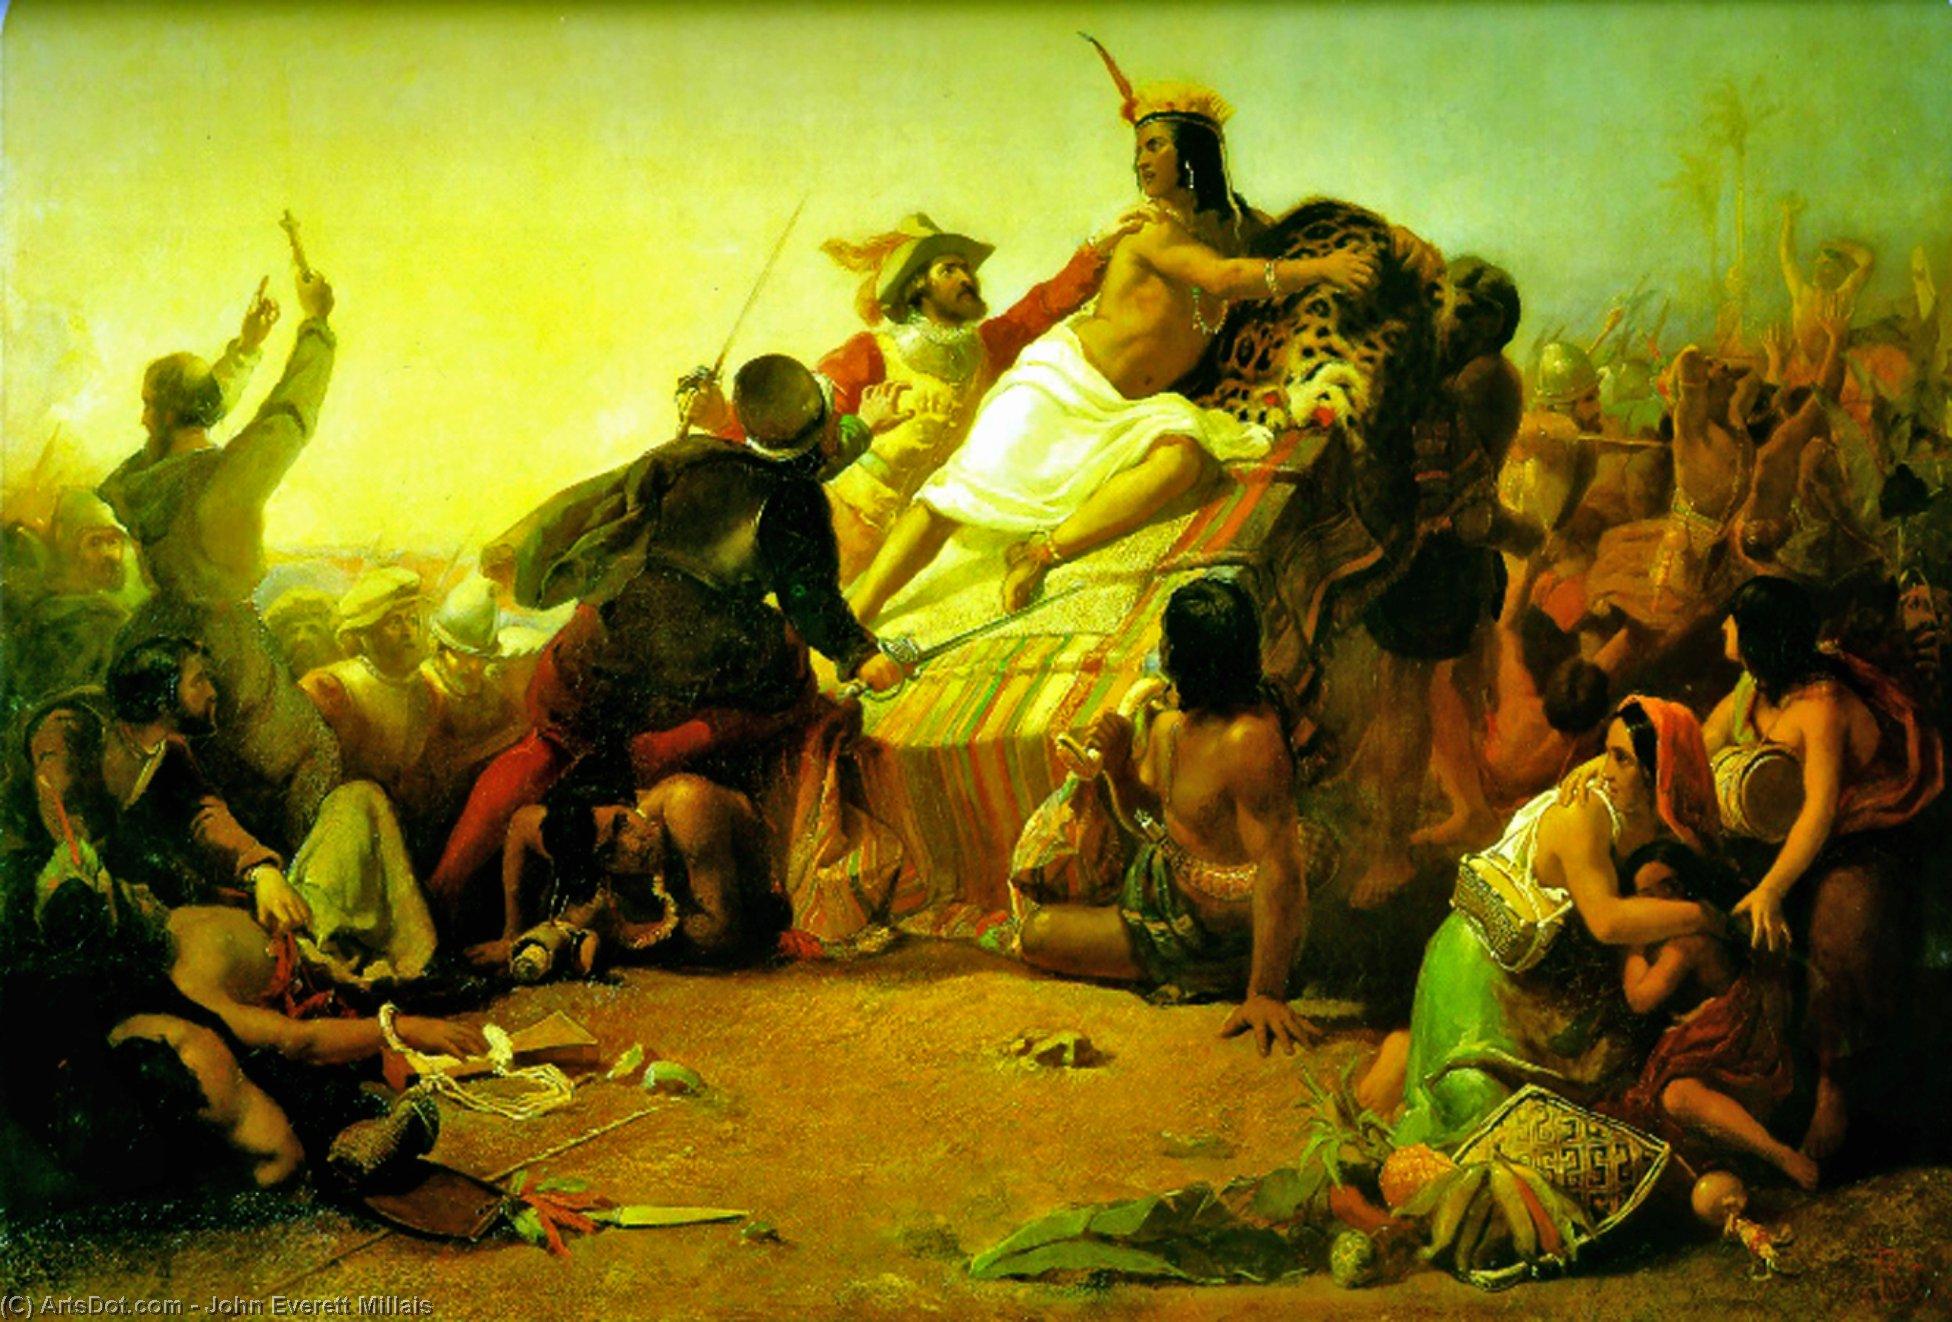 Wikioo.org - The Encyclopedia of Fine Arts - Painting, Artwork by John Everett Millais - Pizarro Seizing the Inca of Peru